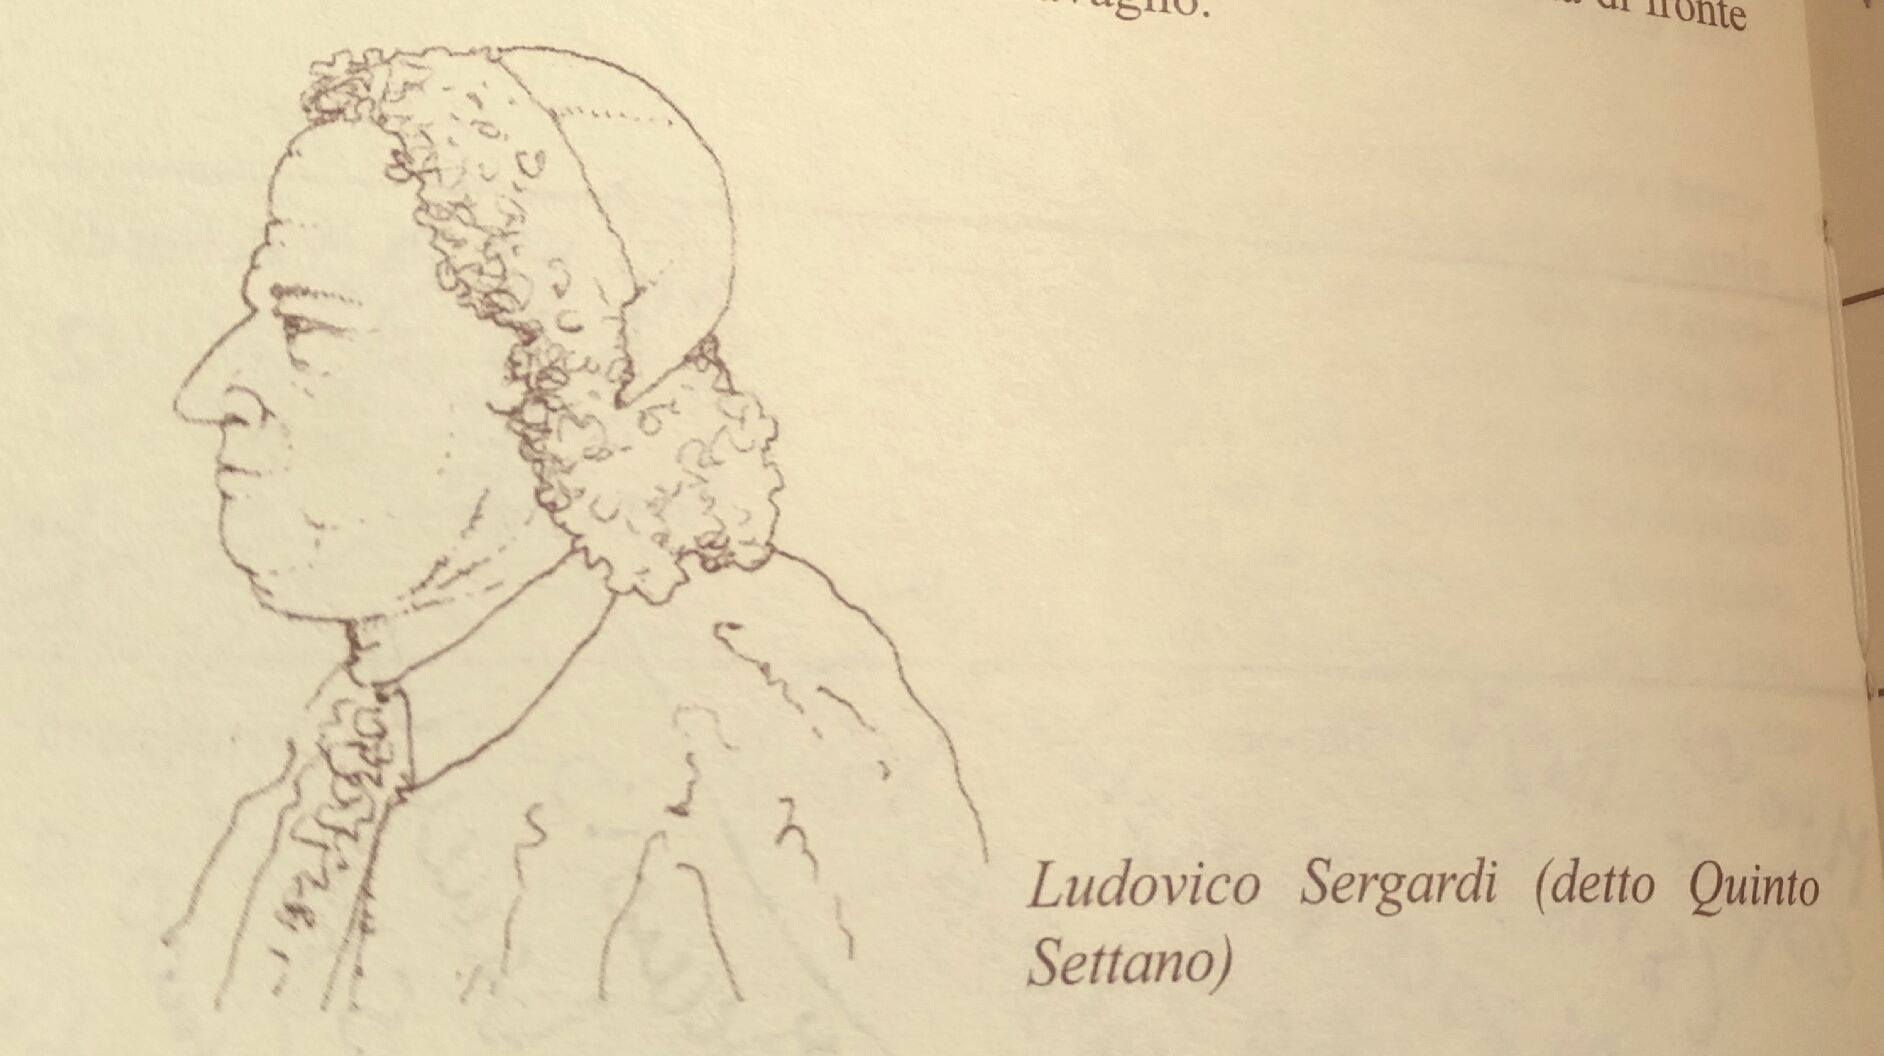 Lodovico Sergardi